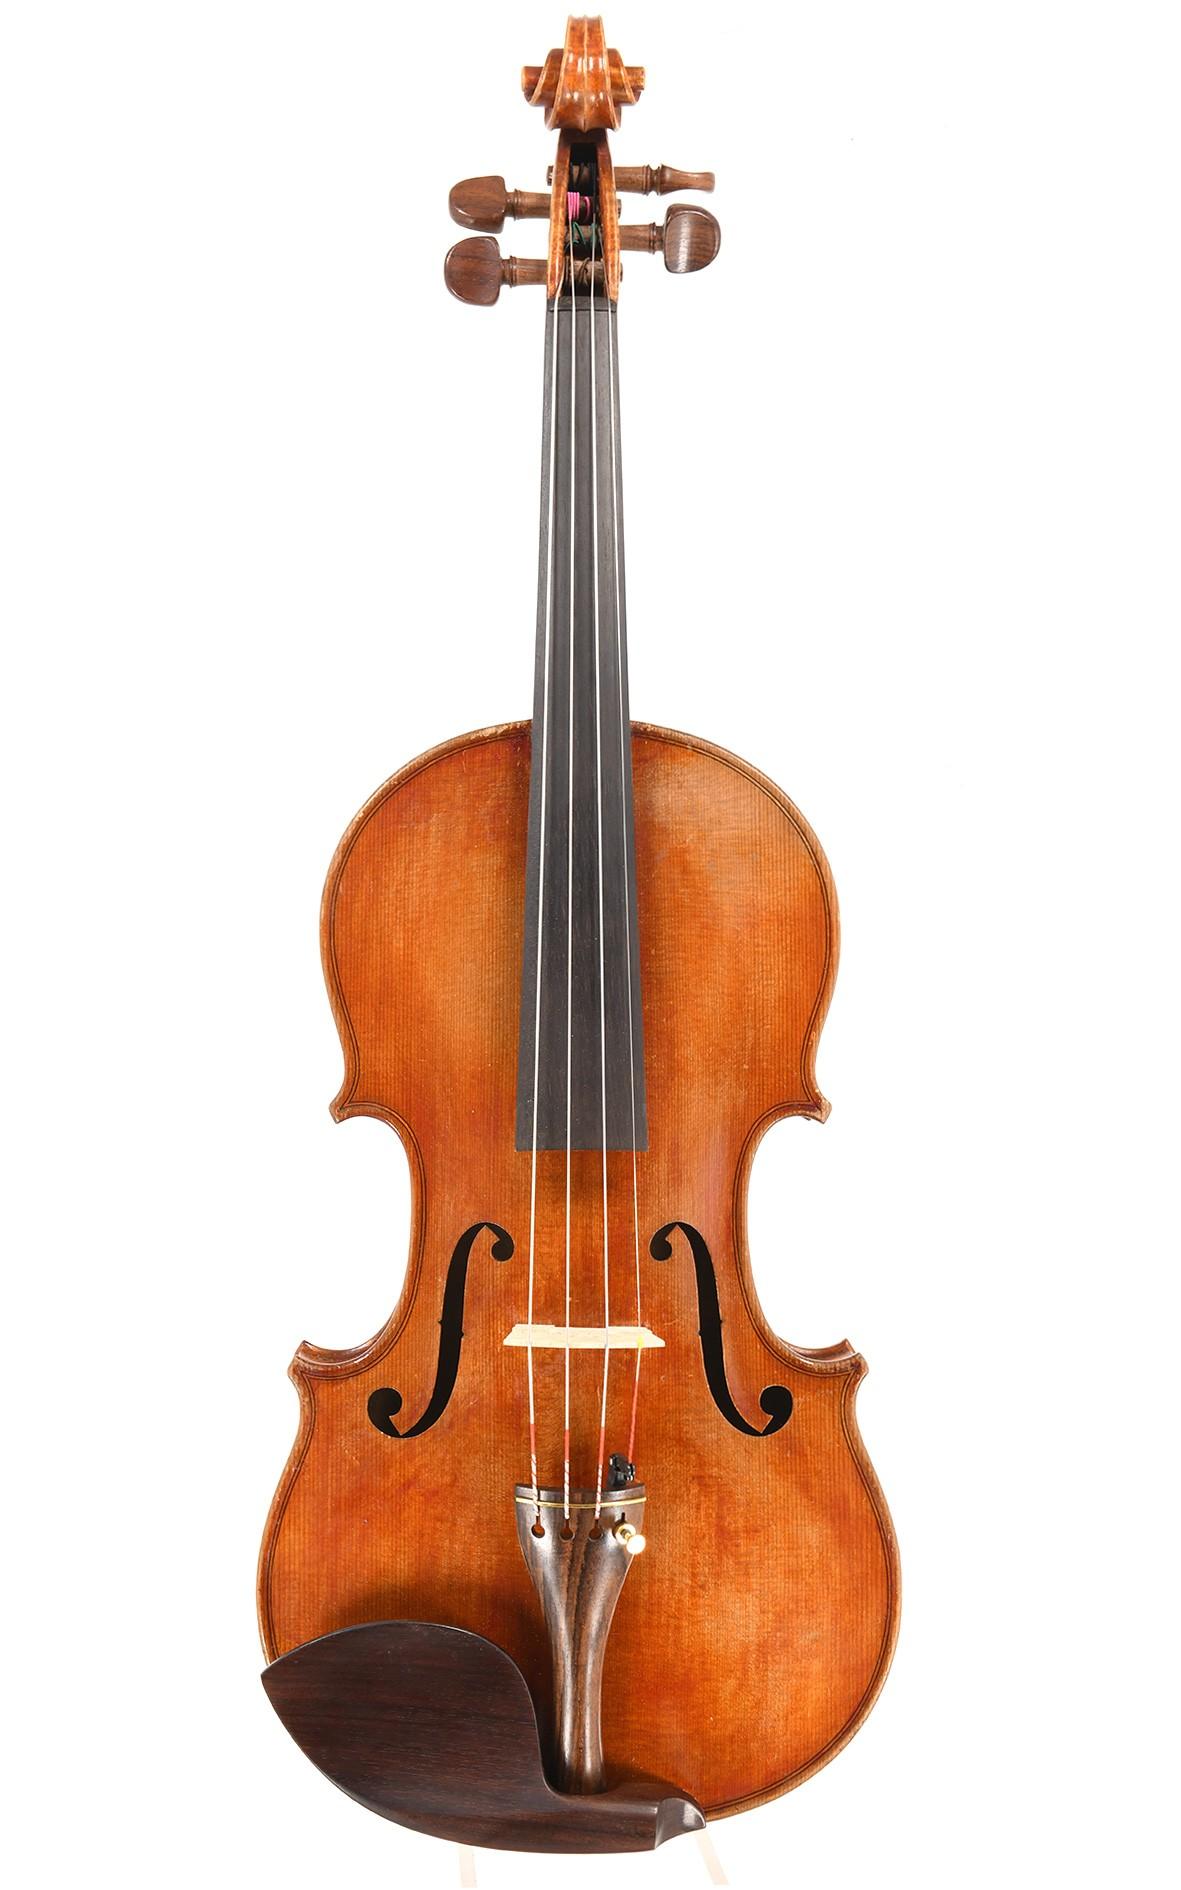 French violin by Jean Striebig, Mirecourt